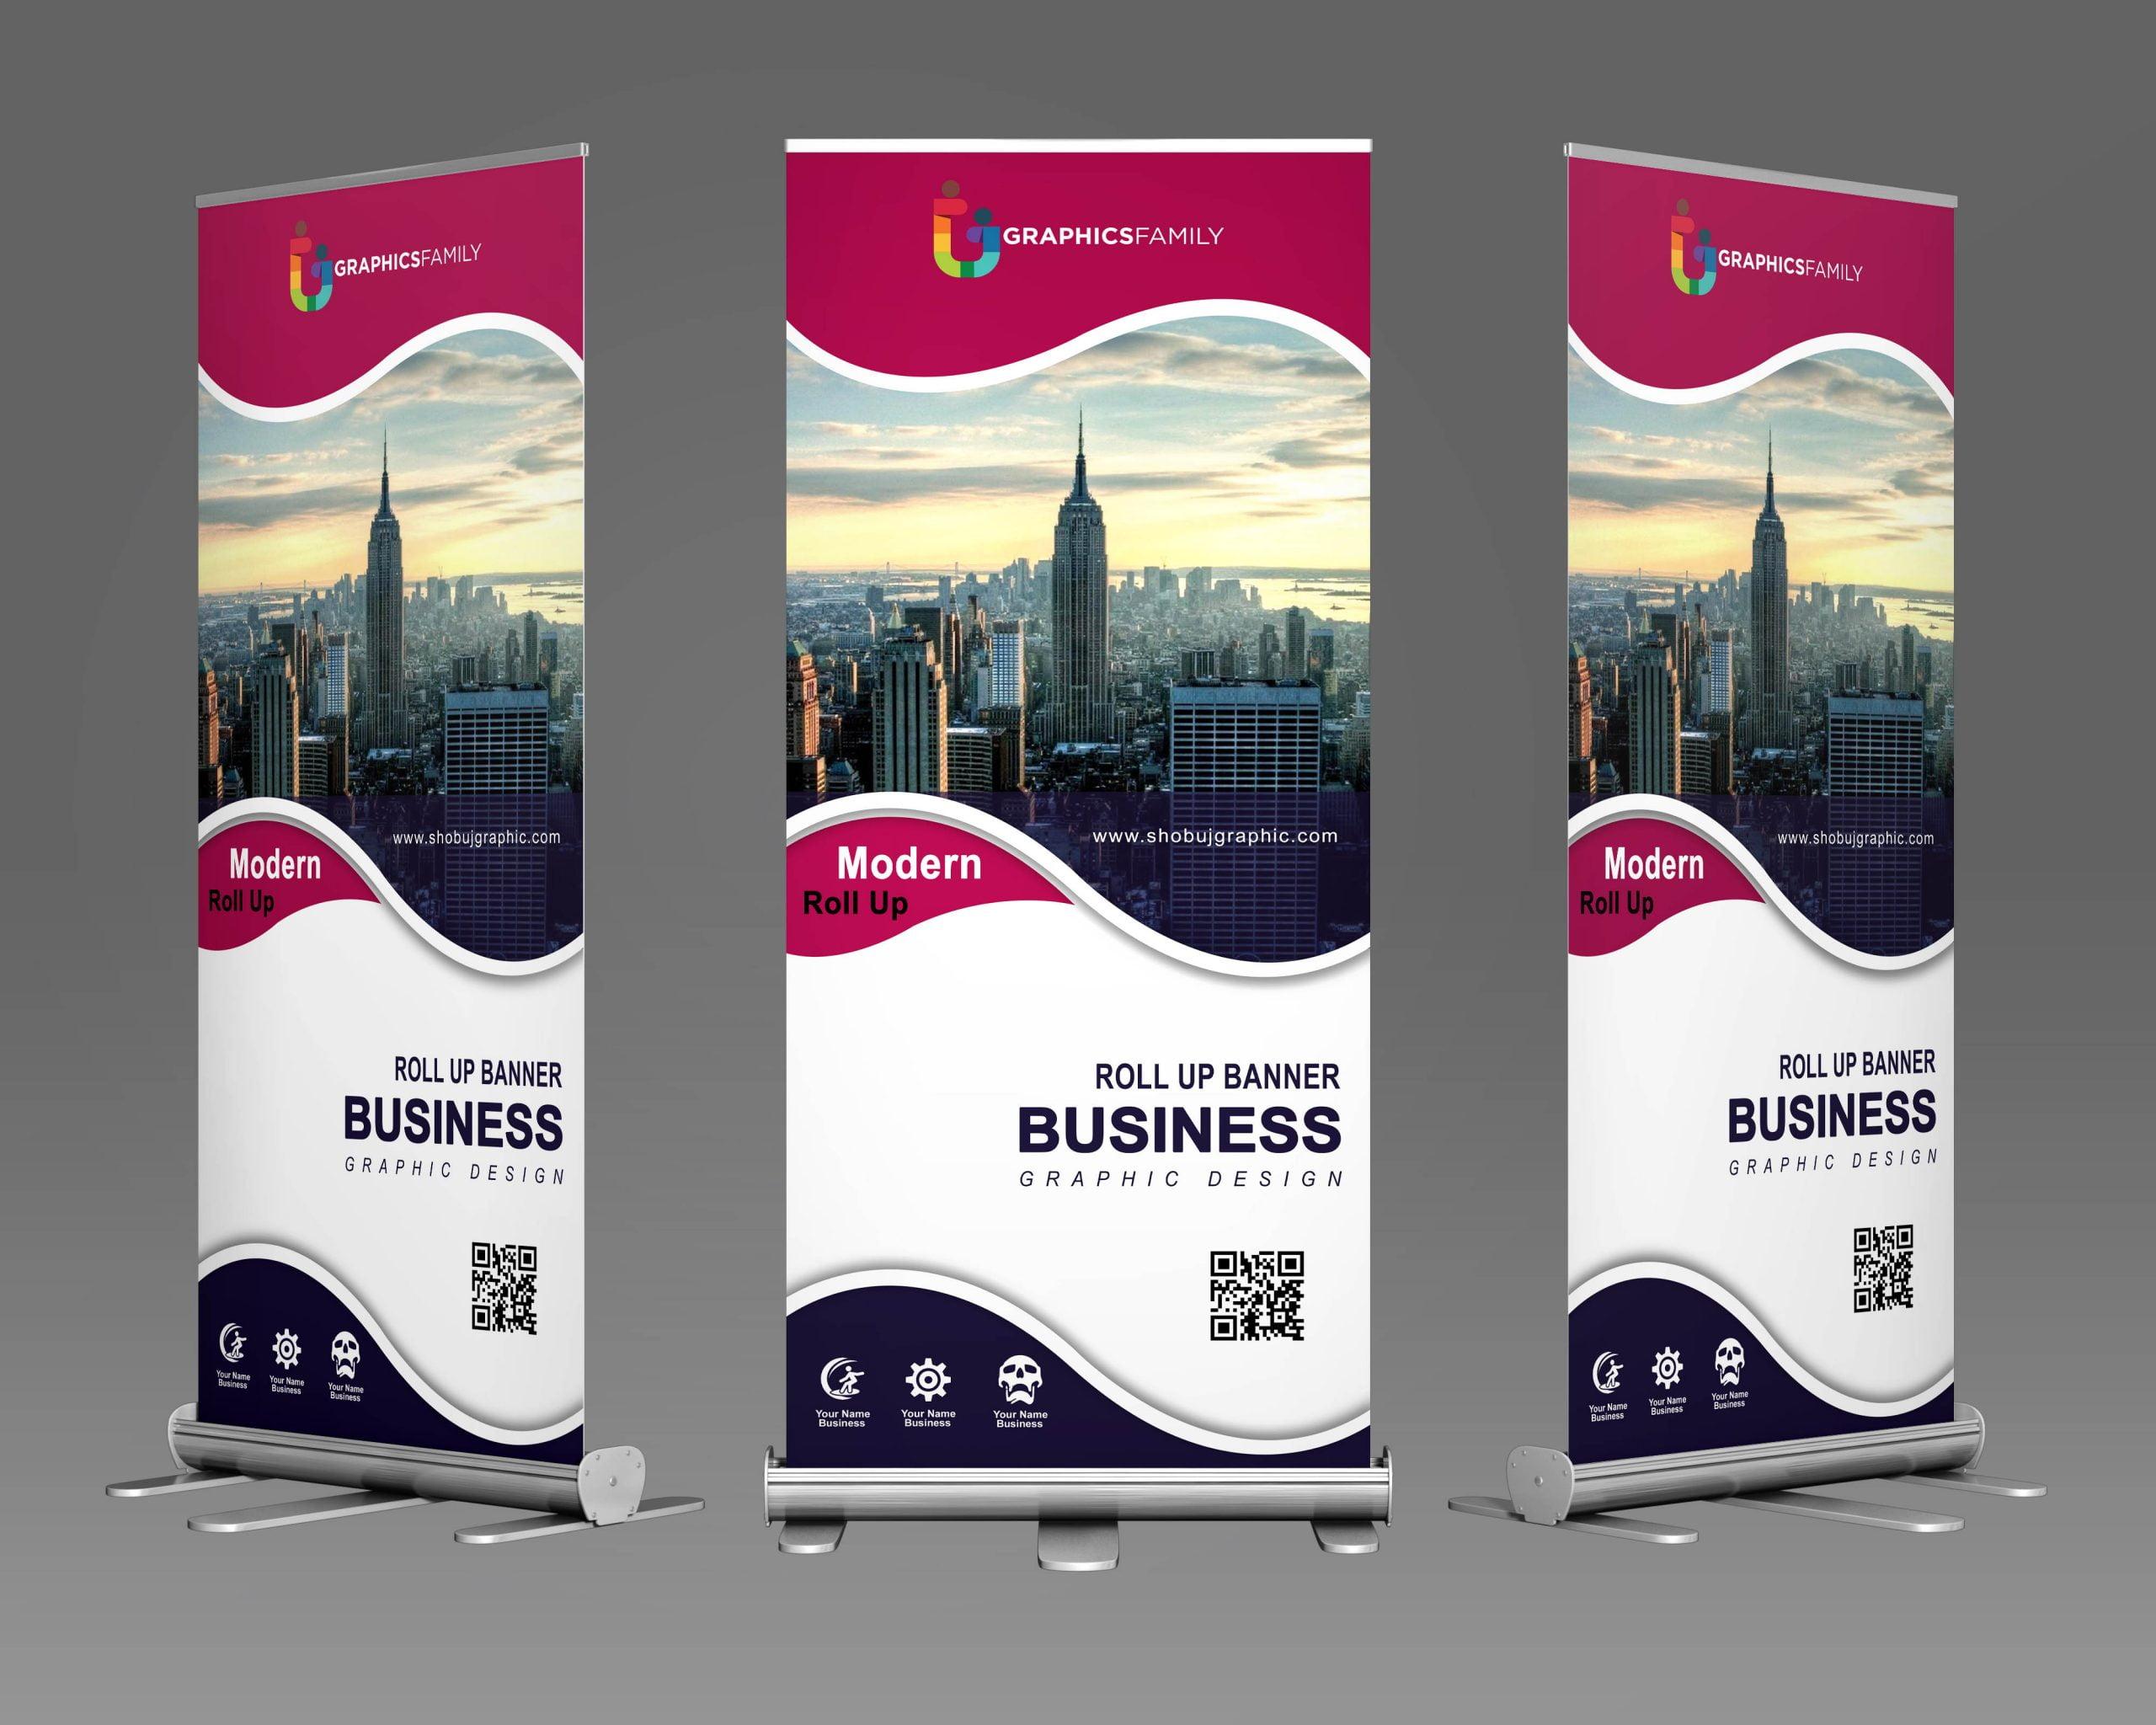 Modern Roll up Banner for marketing